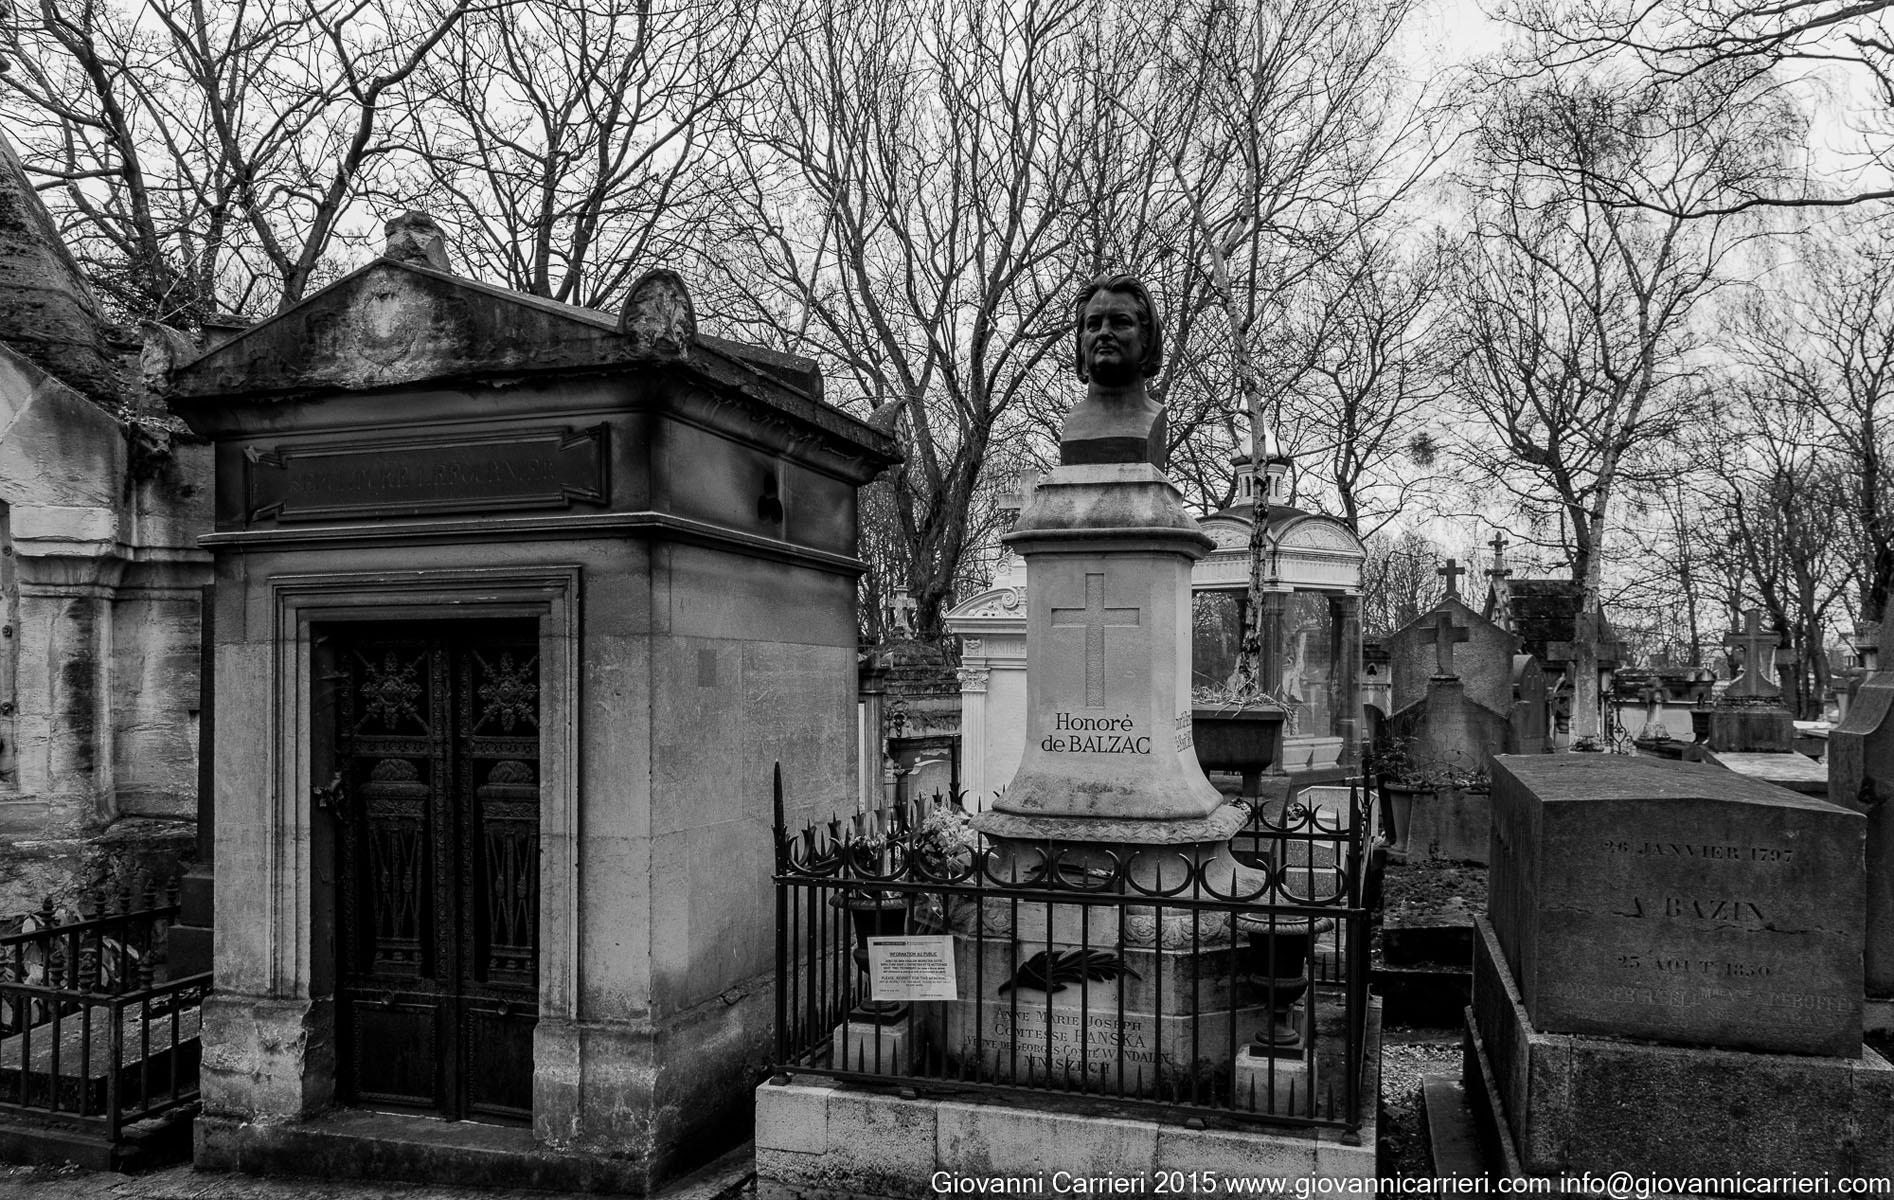 La tomba di Honorè de Balzac